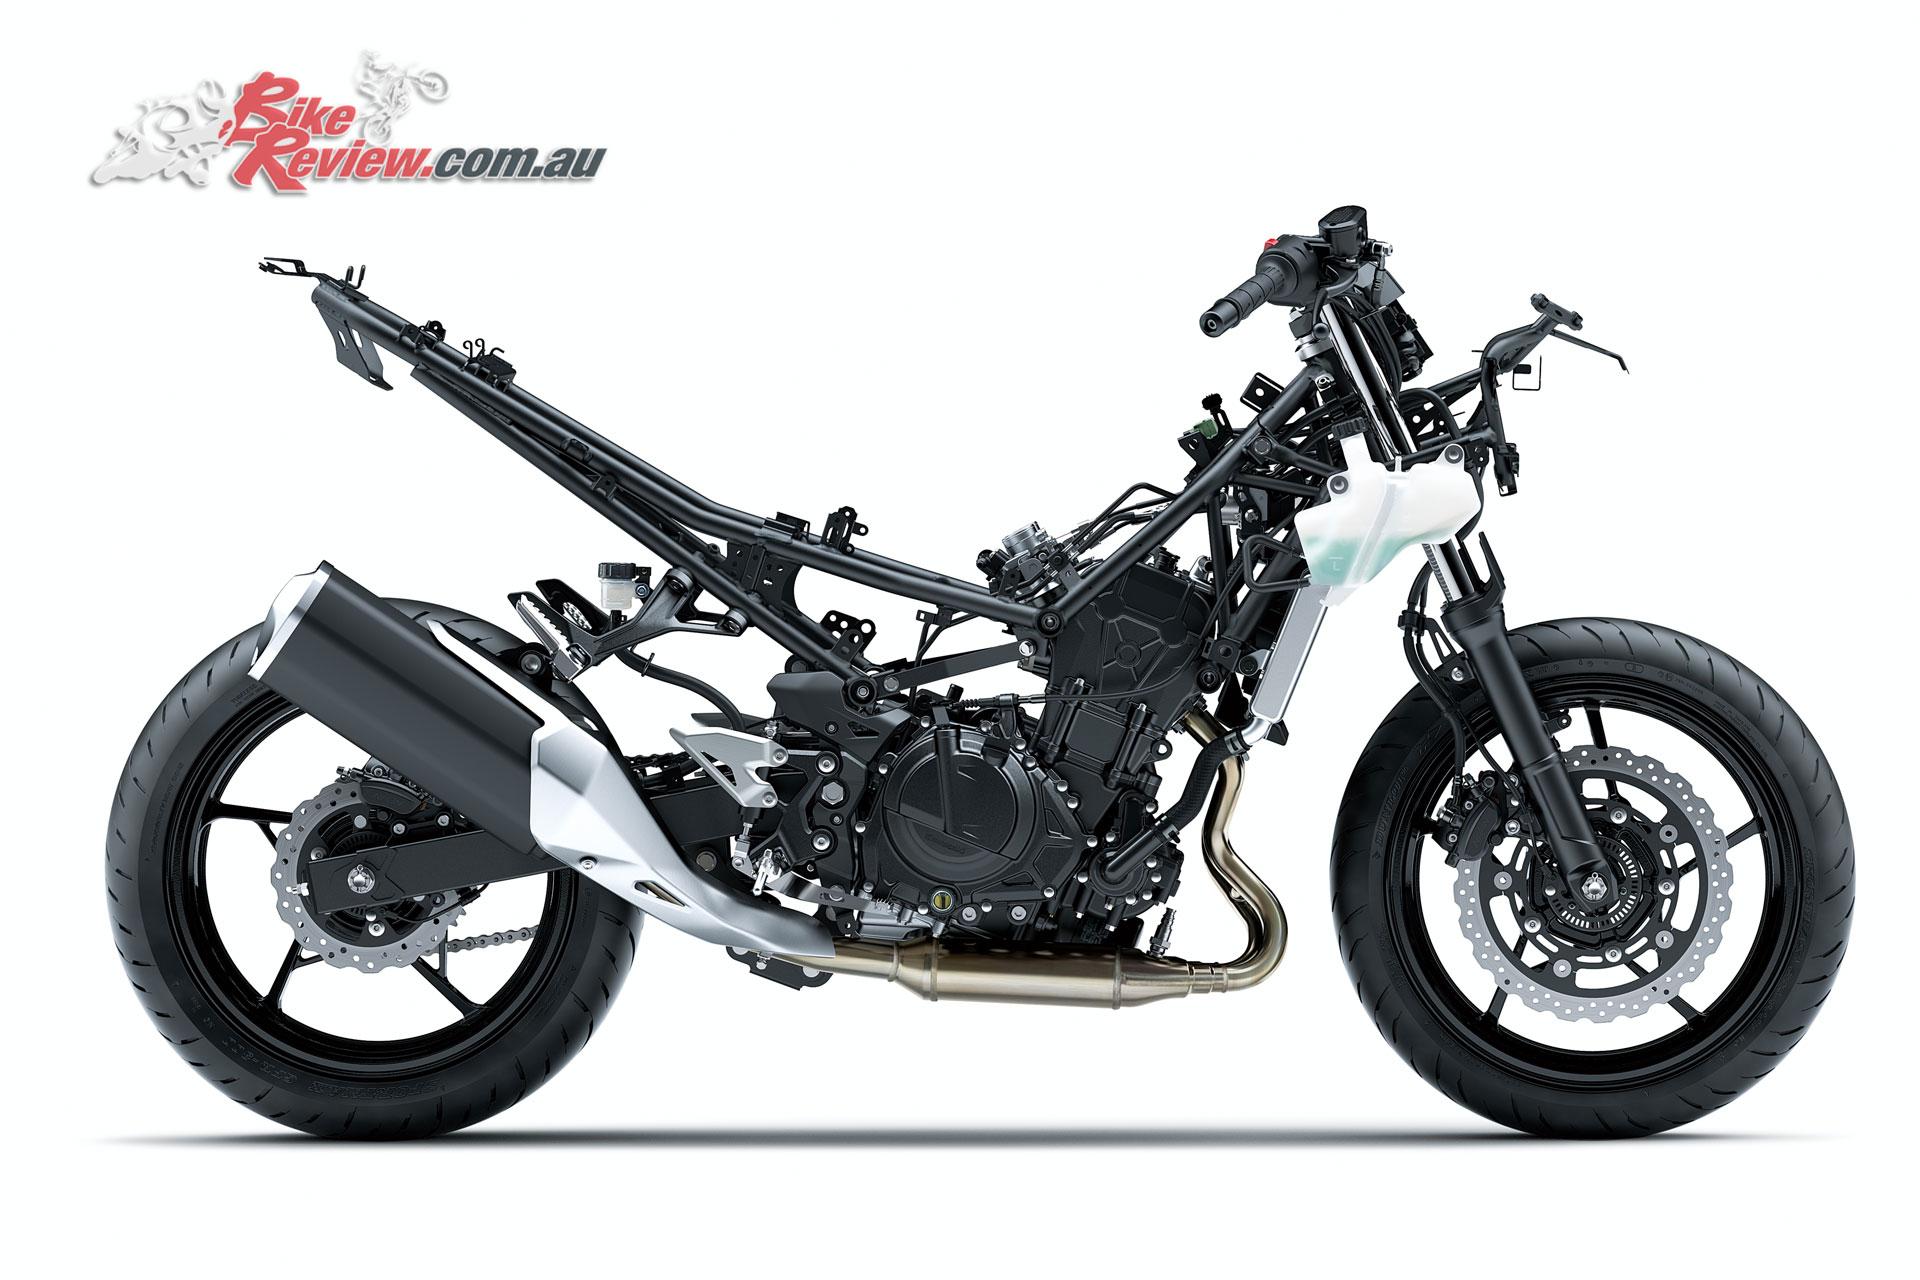 2018-Kawasaki-Ninja-400-LAMS-Bike-Review-EX400G-24